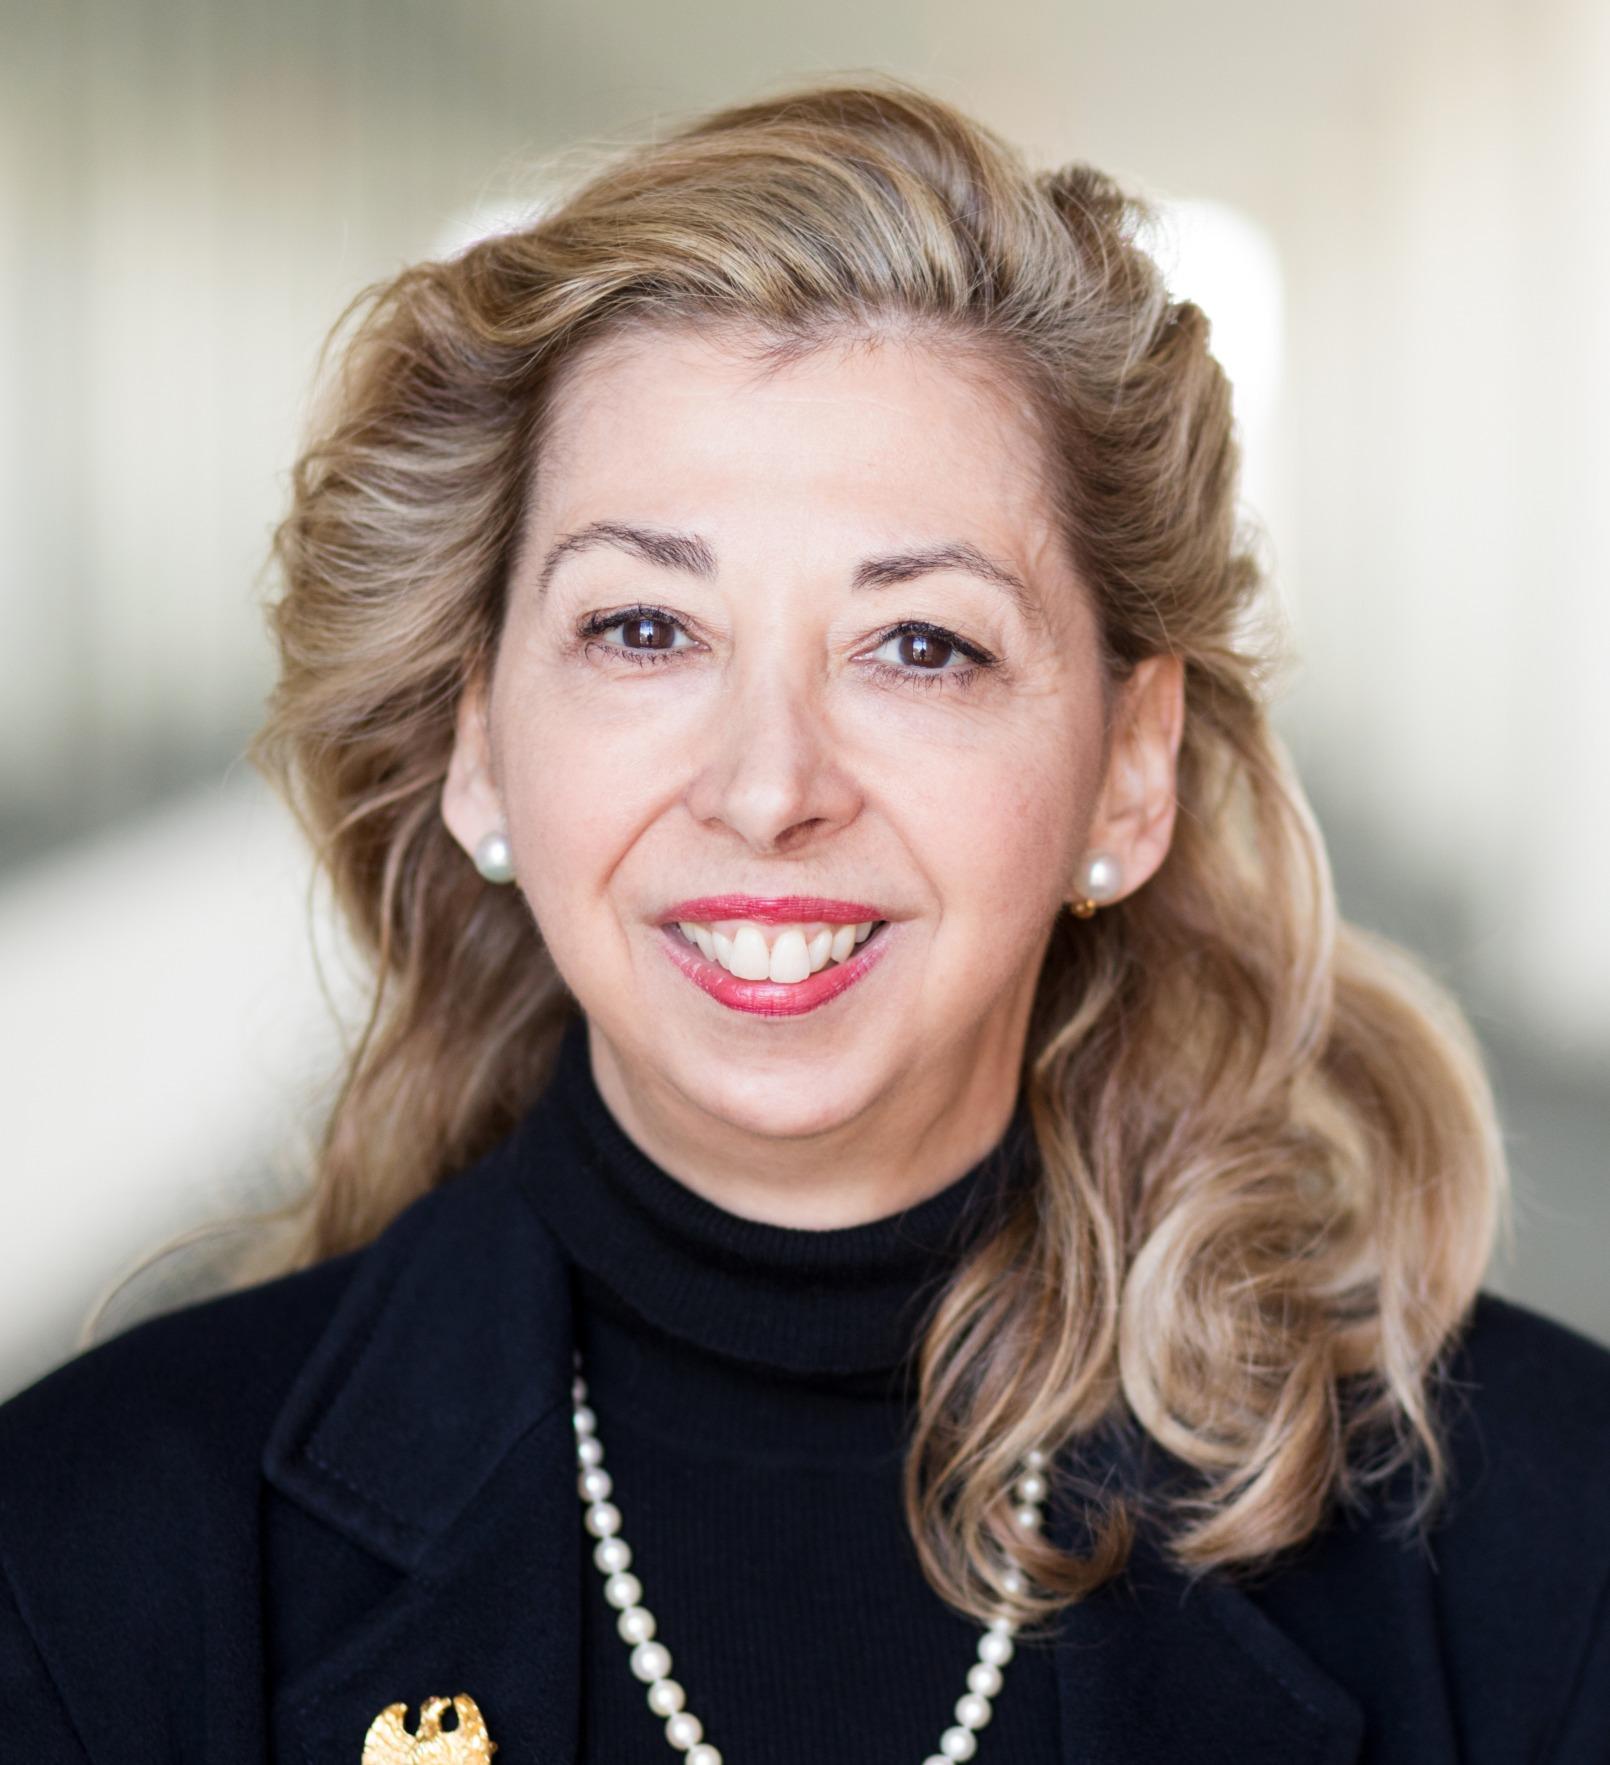 Laura Peter